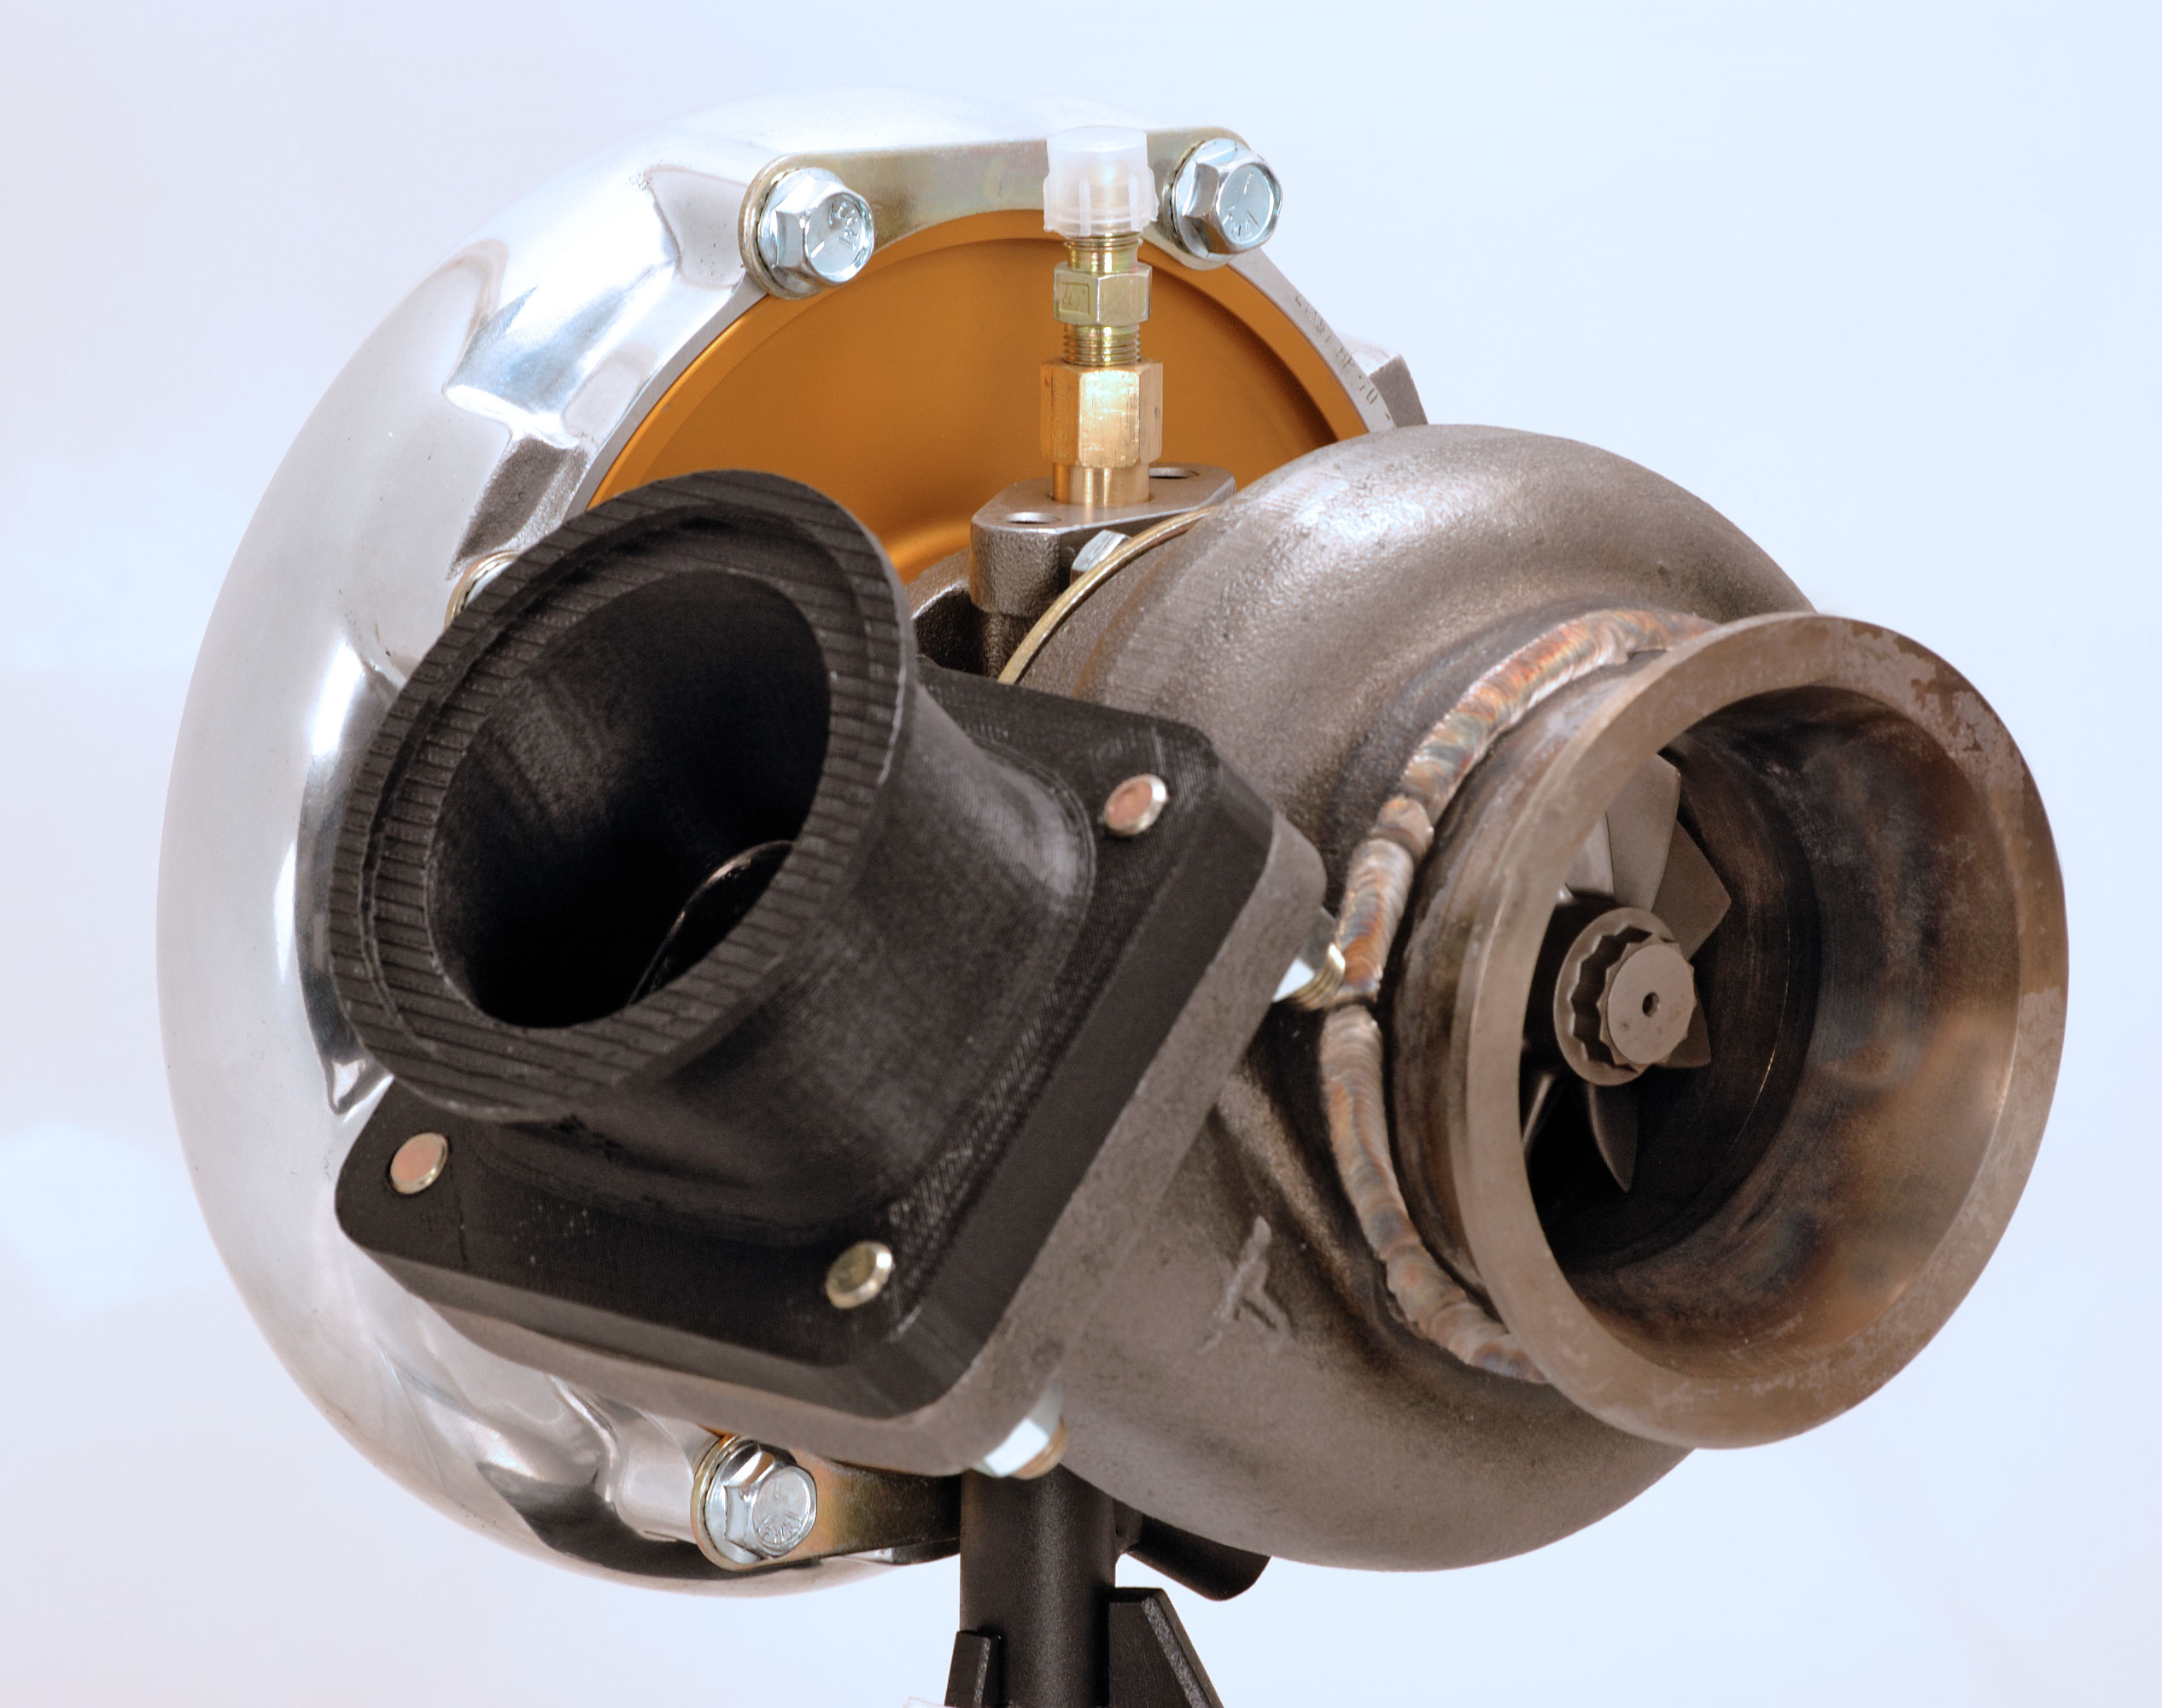 Ford 6.0 Diesel >> Turbo Pedestal Kit for Ford 6.0L Powerstroke Diesel by ...